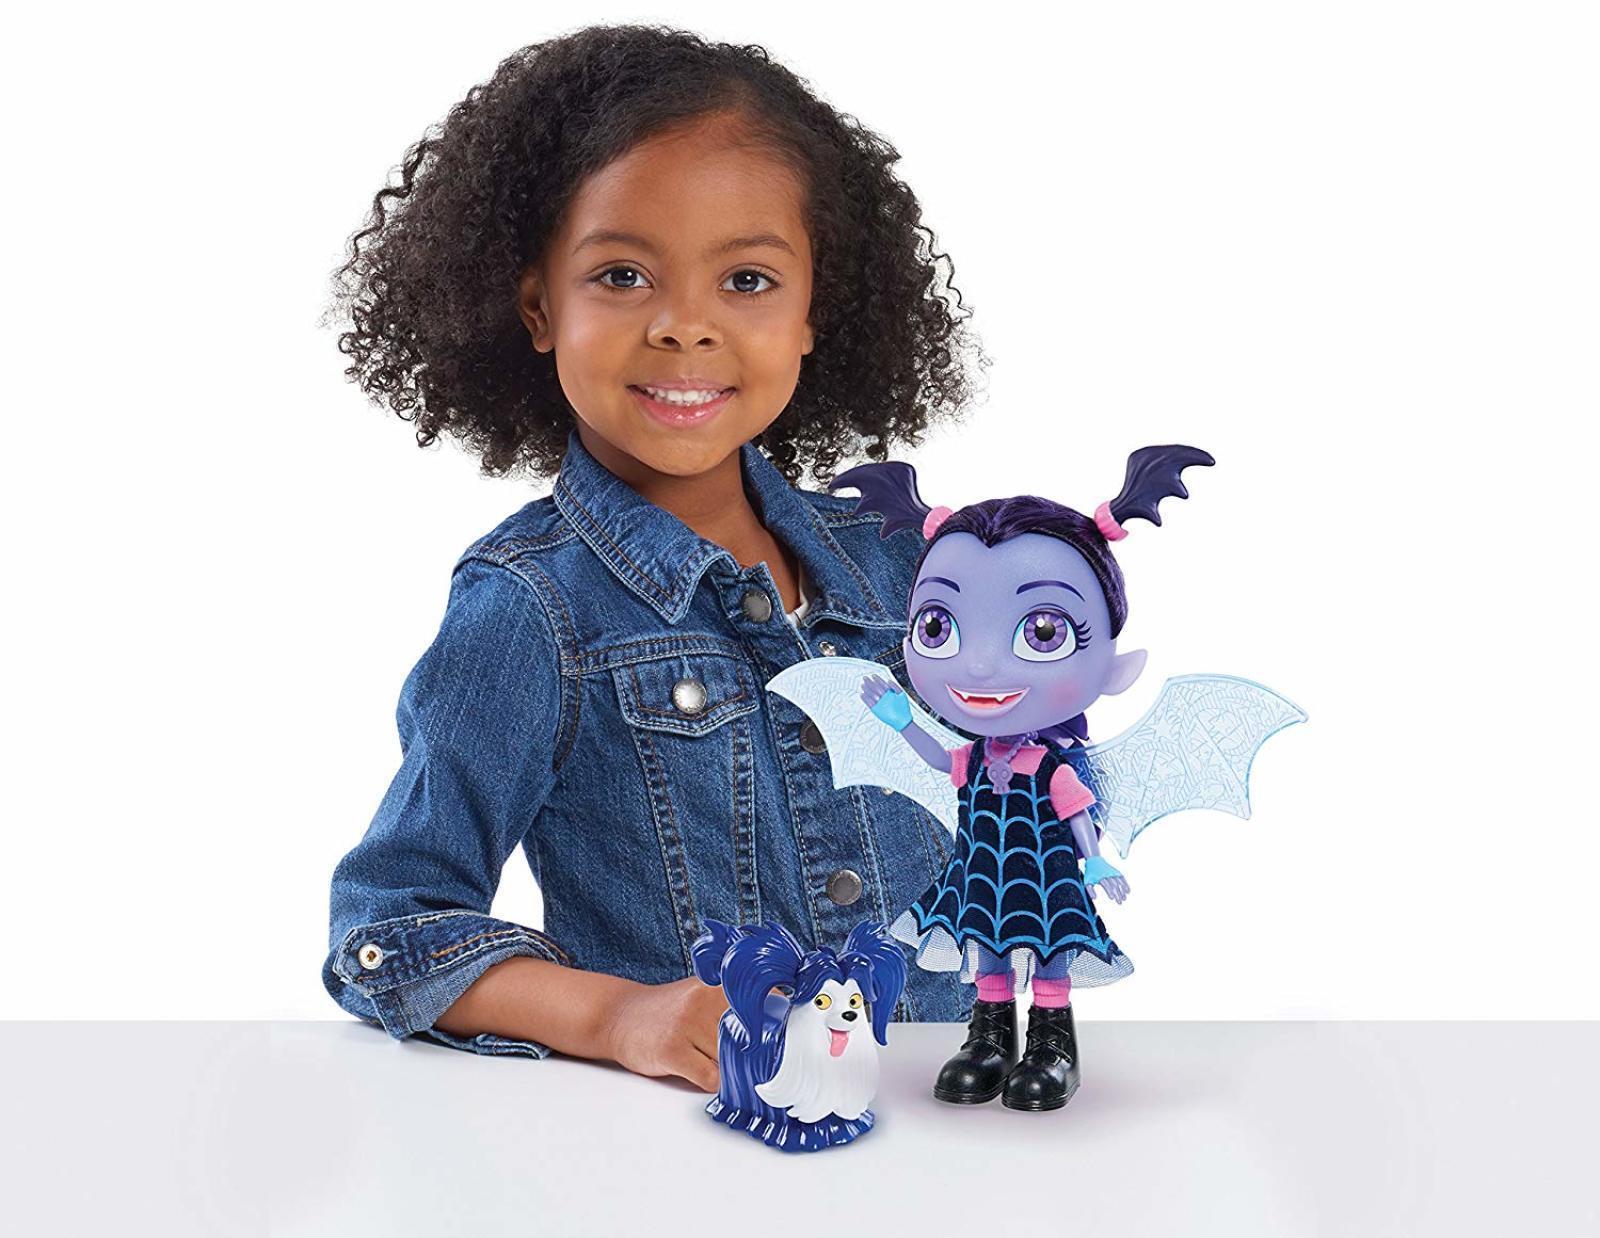 Bat-Tastic Talking Vampirina Doll And Wolfie Play Set Toy Vee Figure Girls Gift